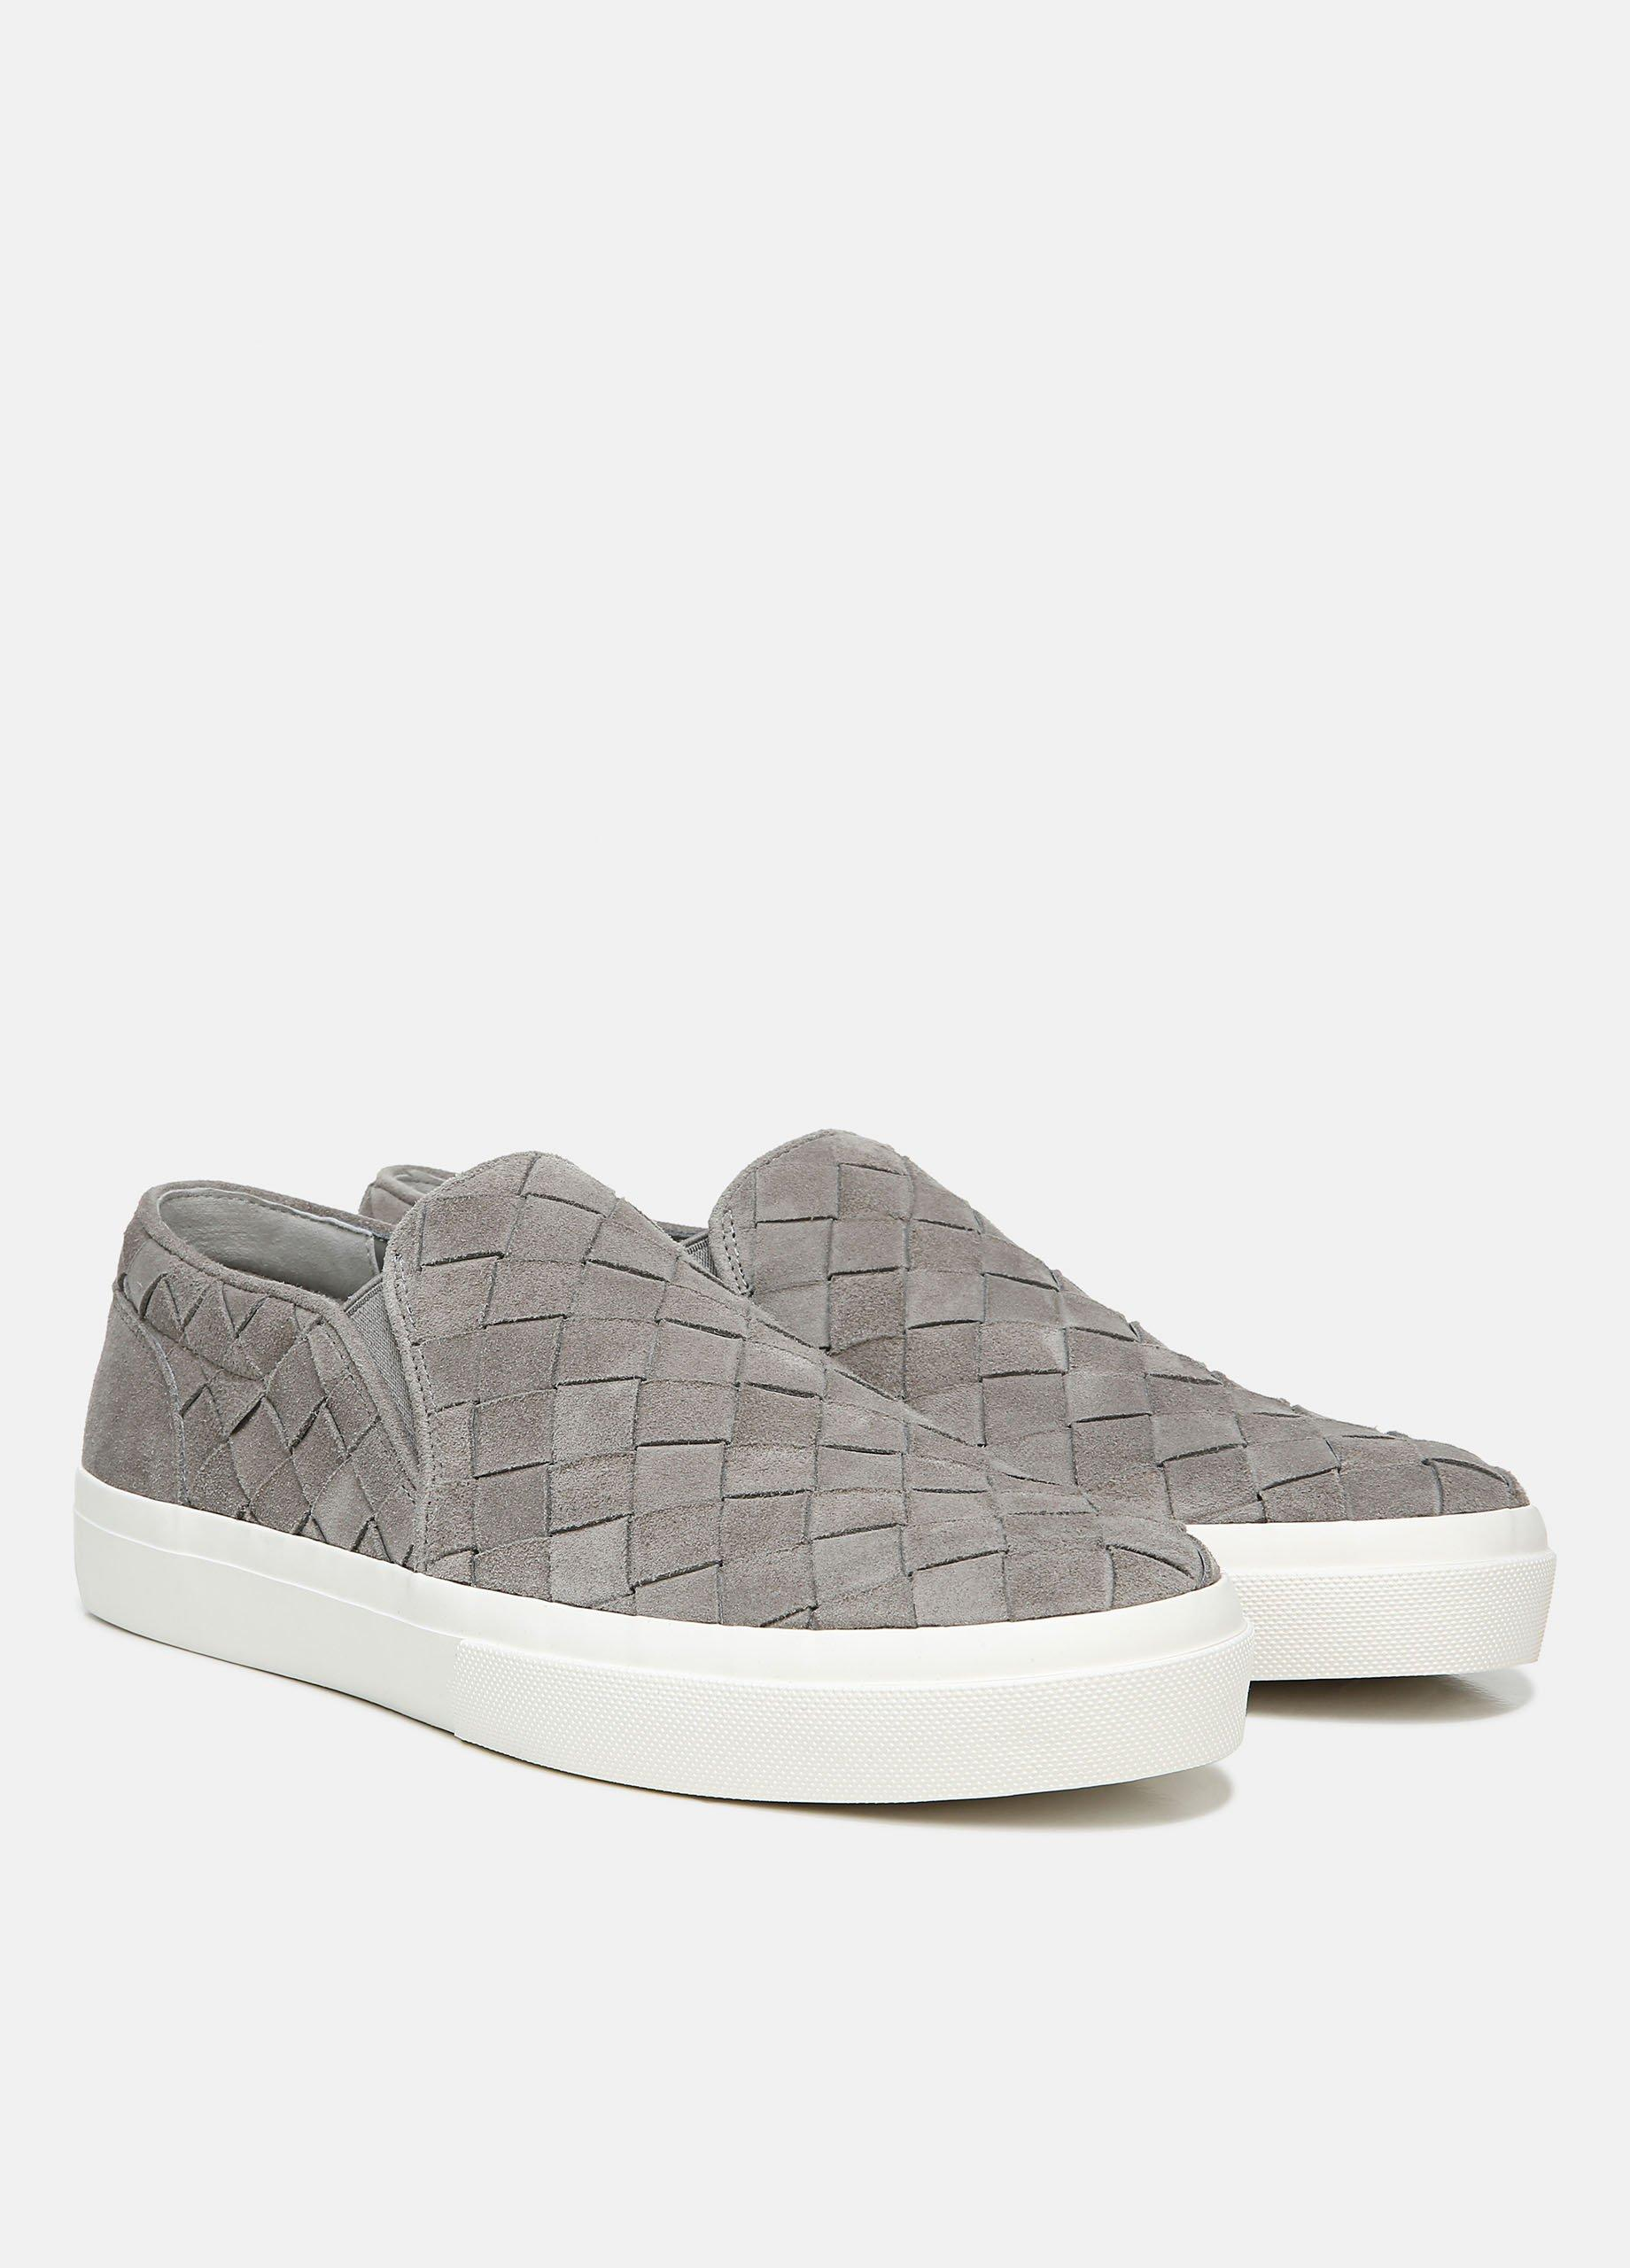 Woven Suede Fletcher Sneaker